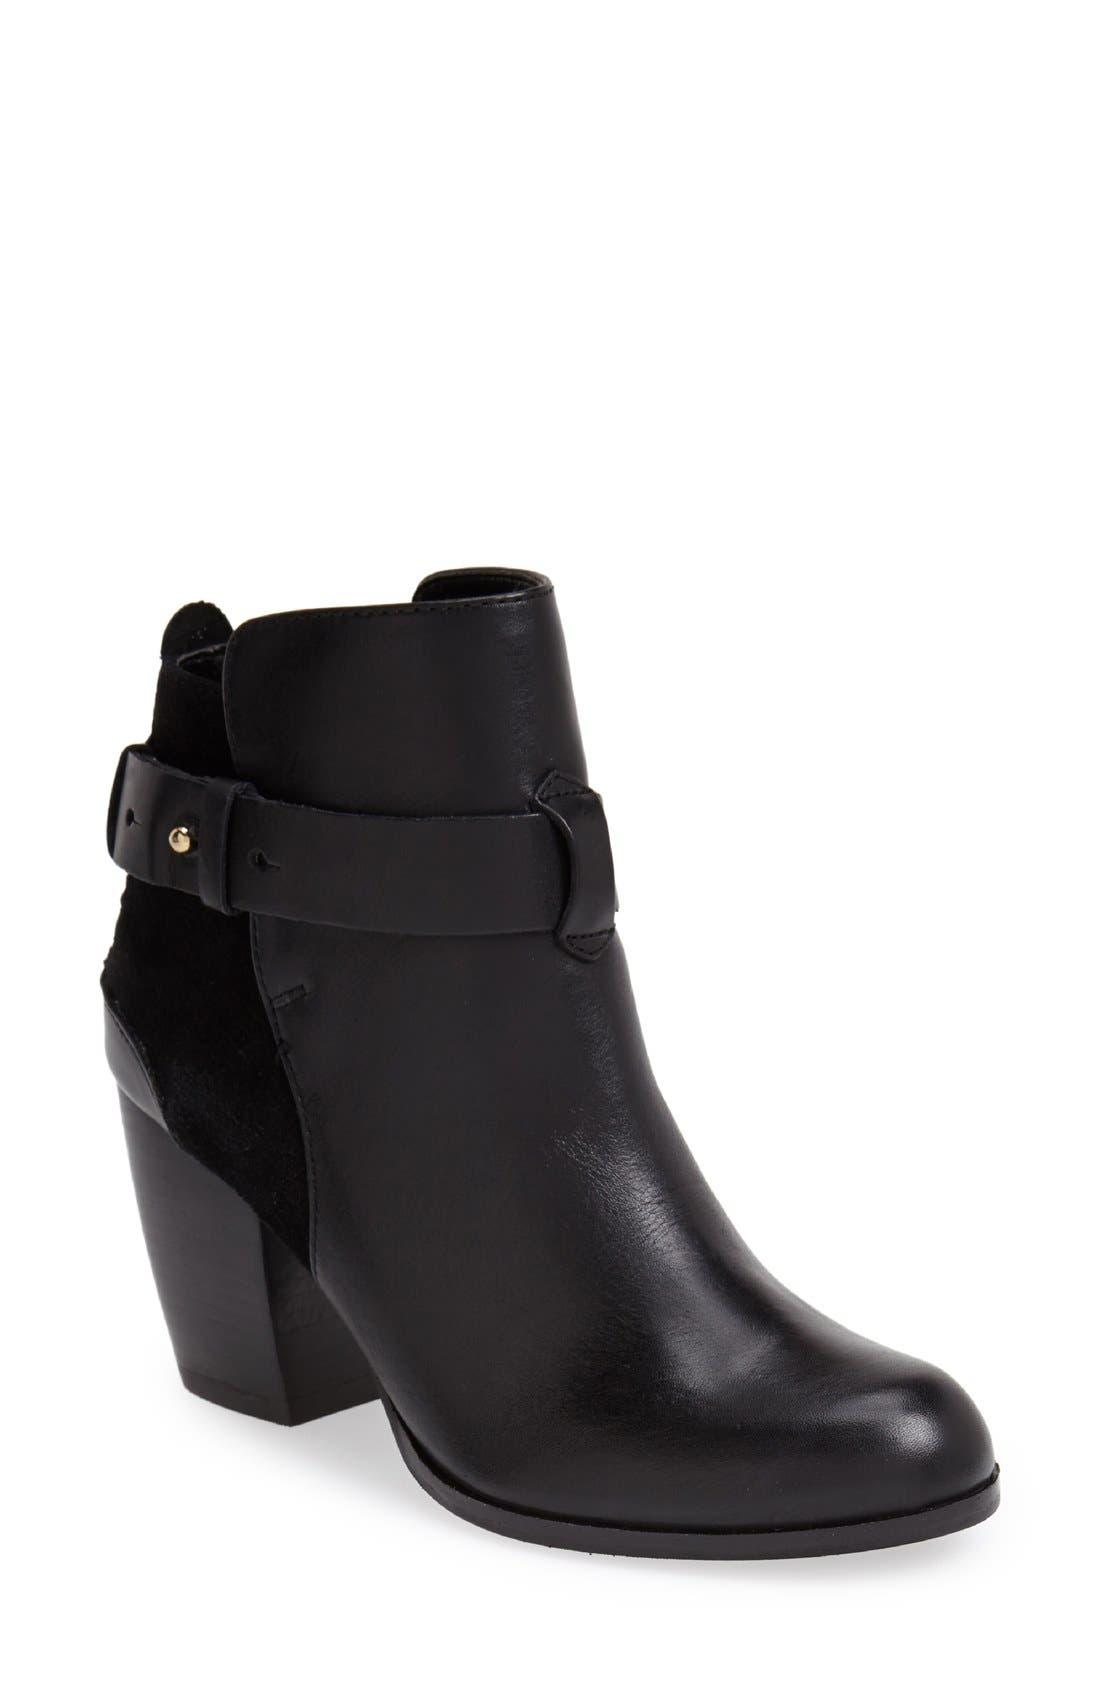 'Parmar' Chunky Heel Bootie,                         Main,                         color, Black